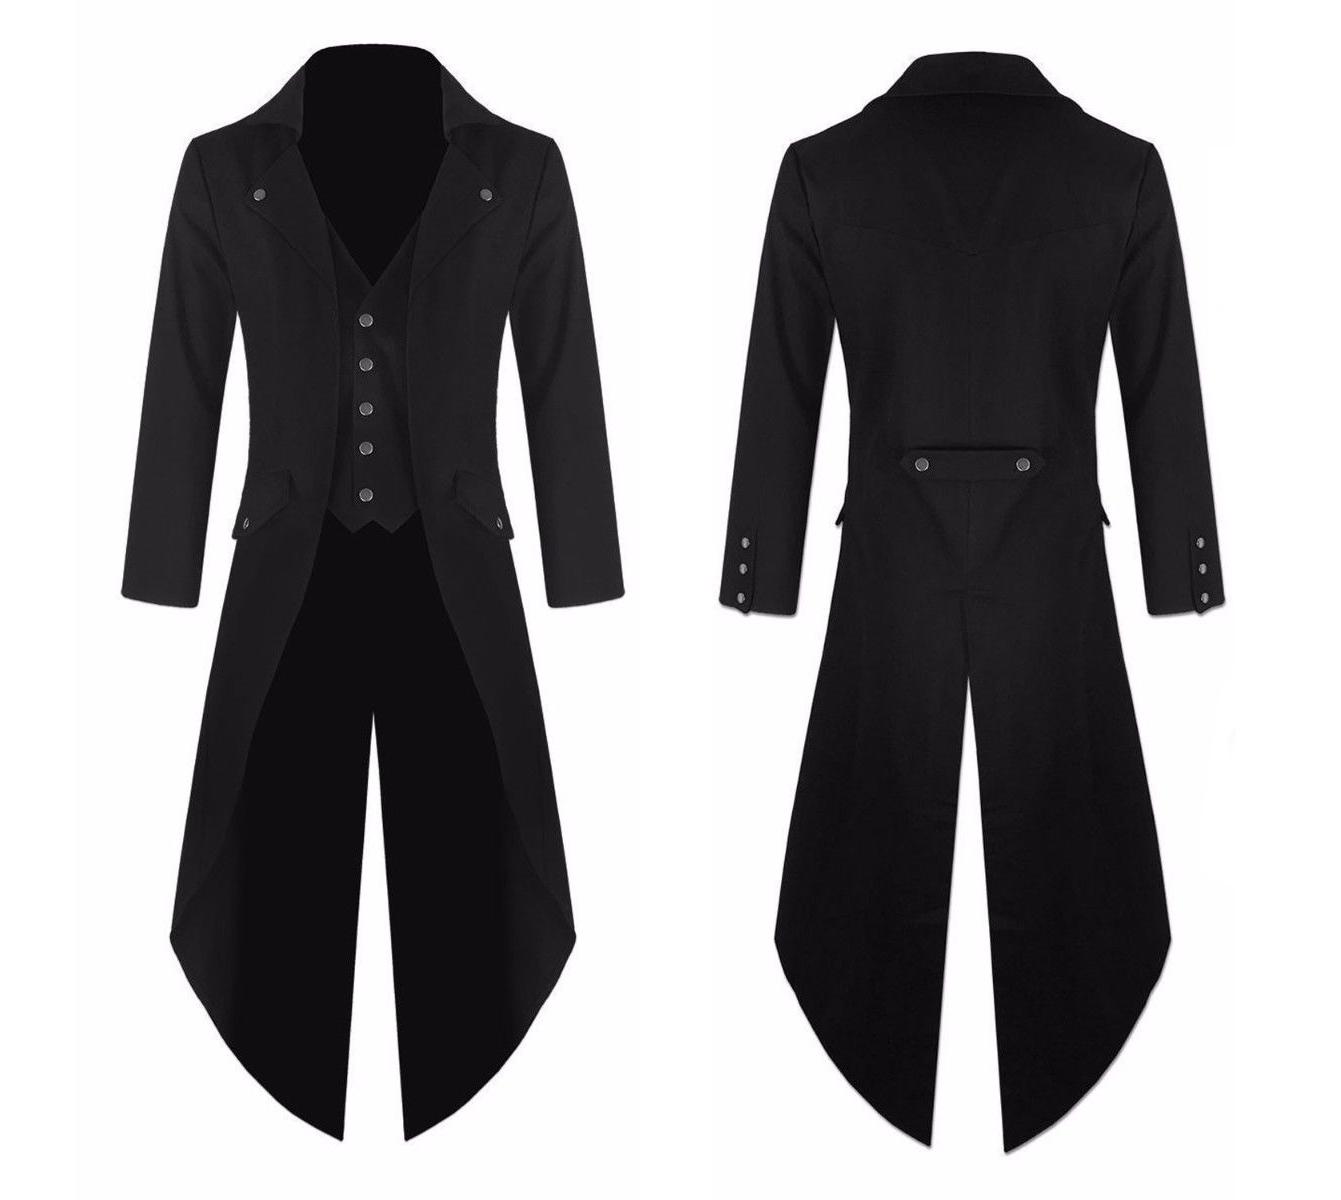 rebelsmarket_mens_gothic_steampunk_tailcoat_jacket_black_gothic_victorian_coat_coats_2.jpg